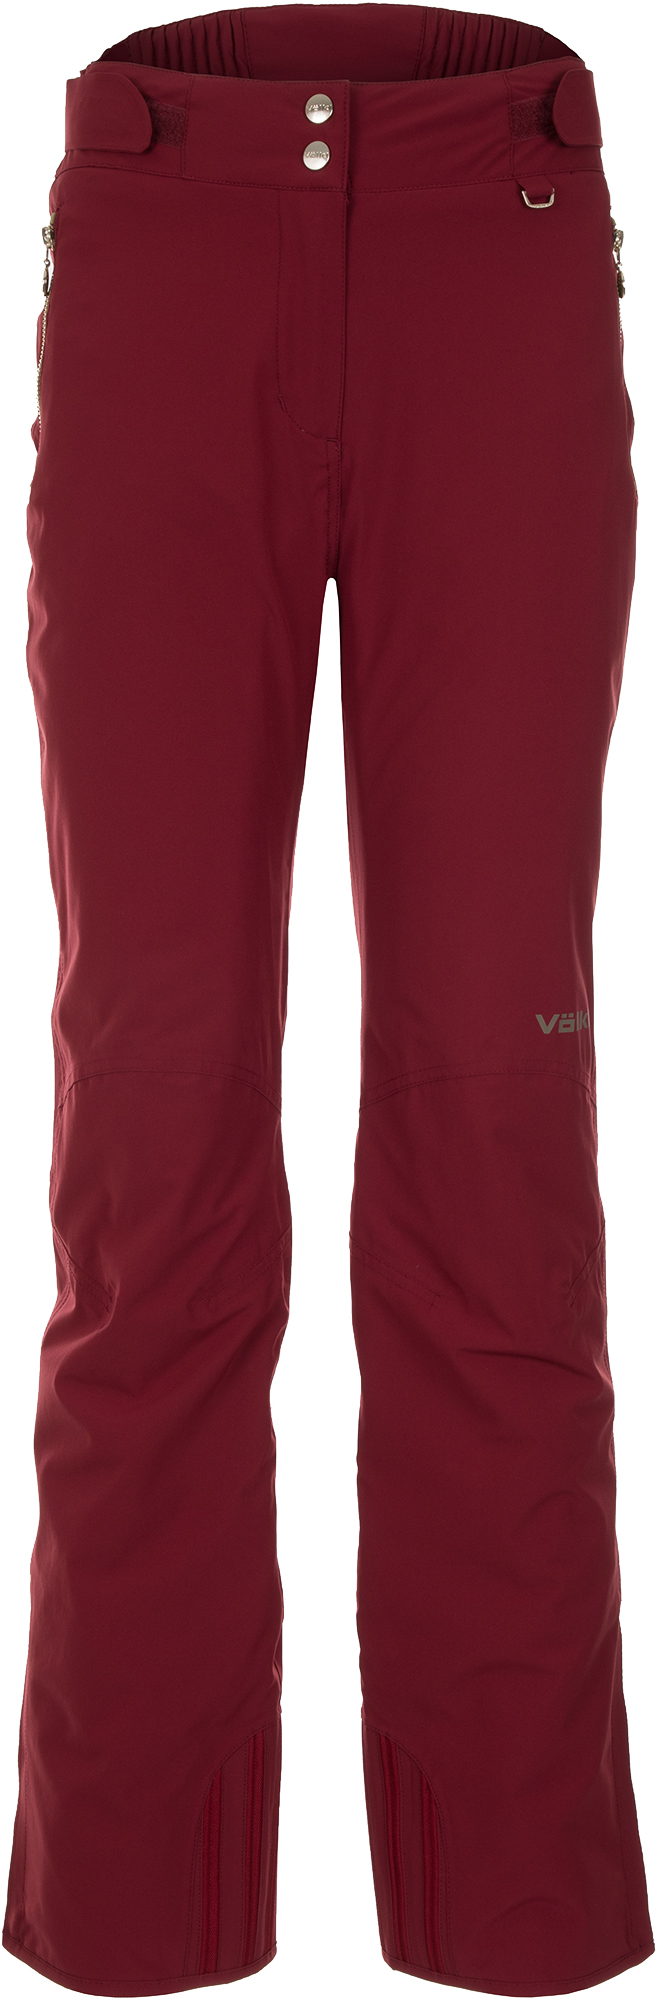 Volkl Брюки утепленные женские Volkl, размер 50 брюки утепленные